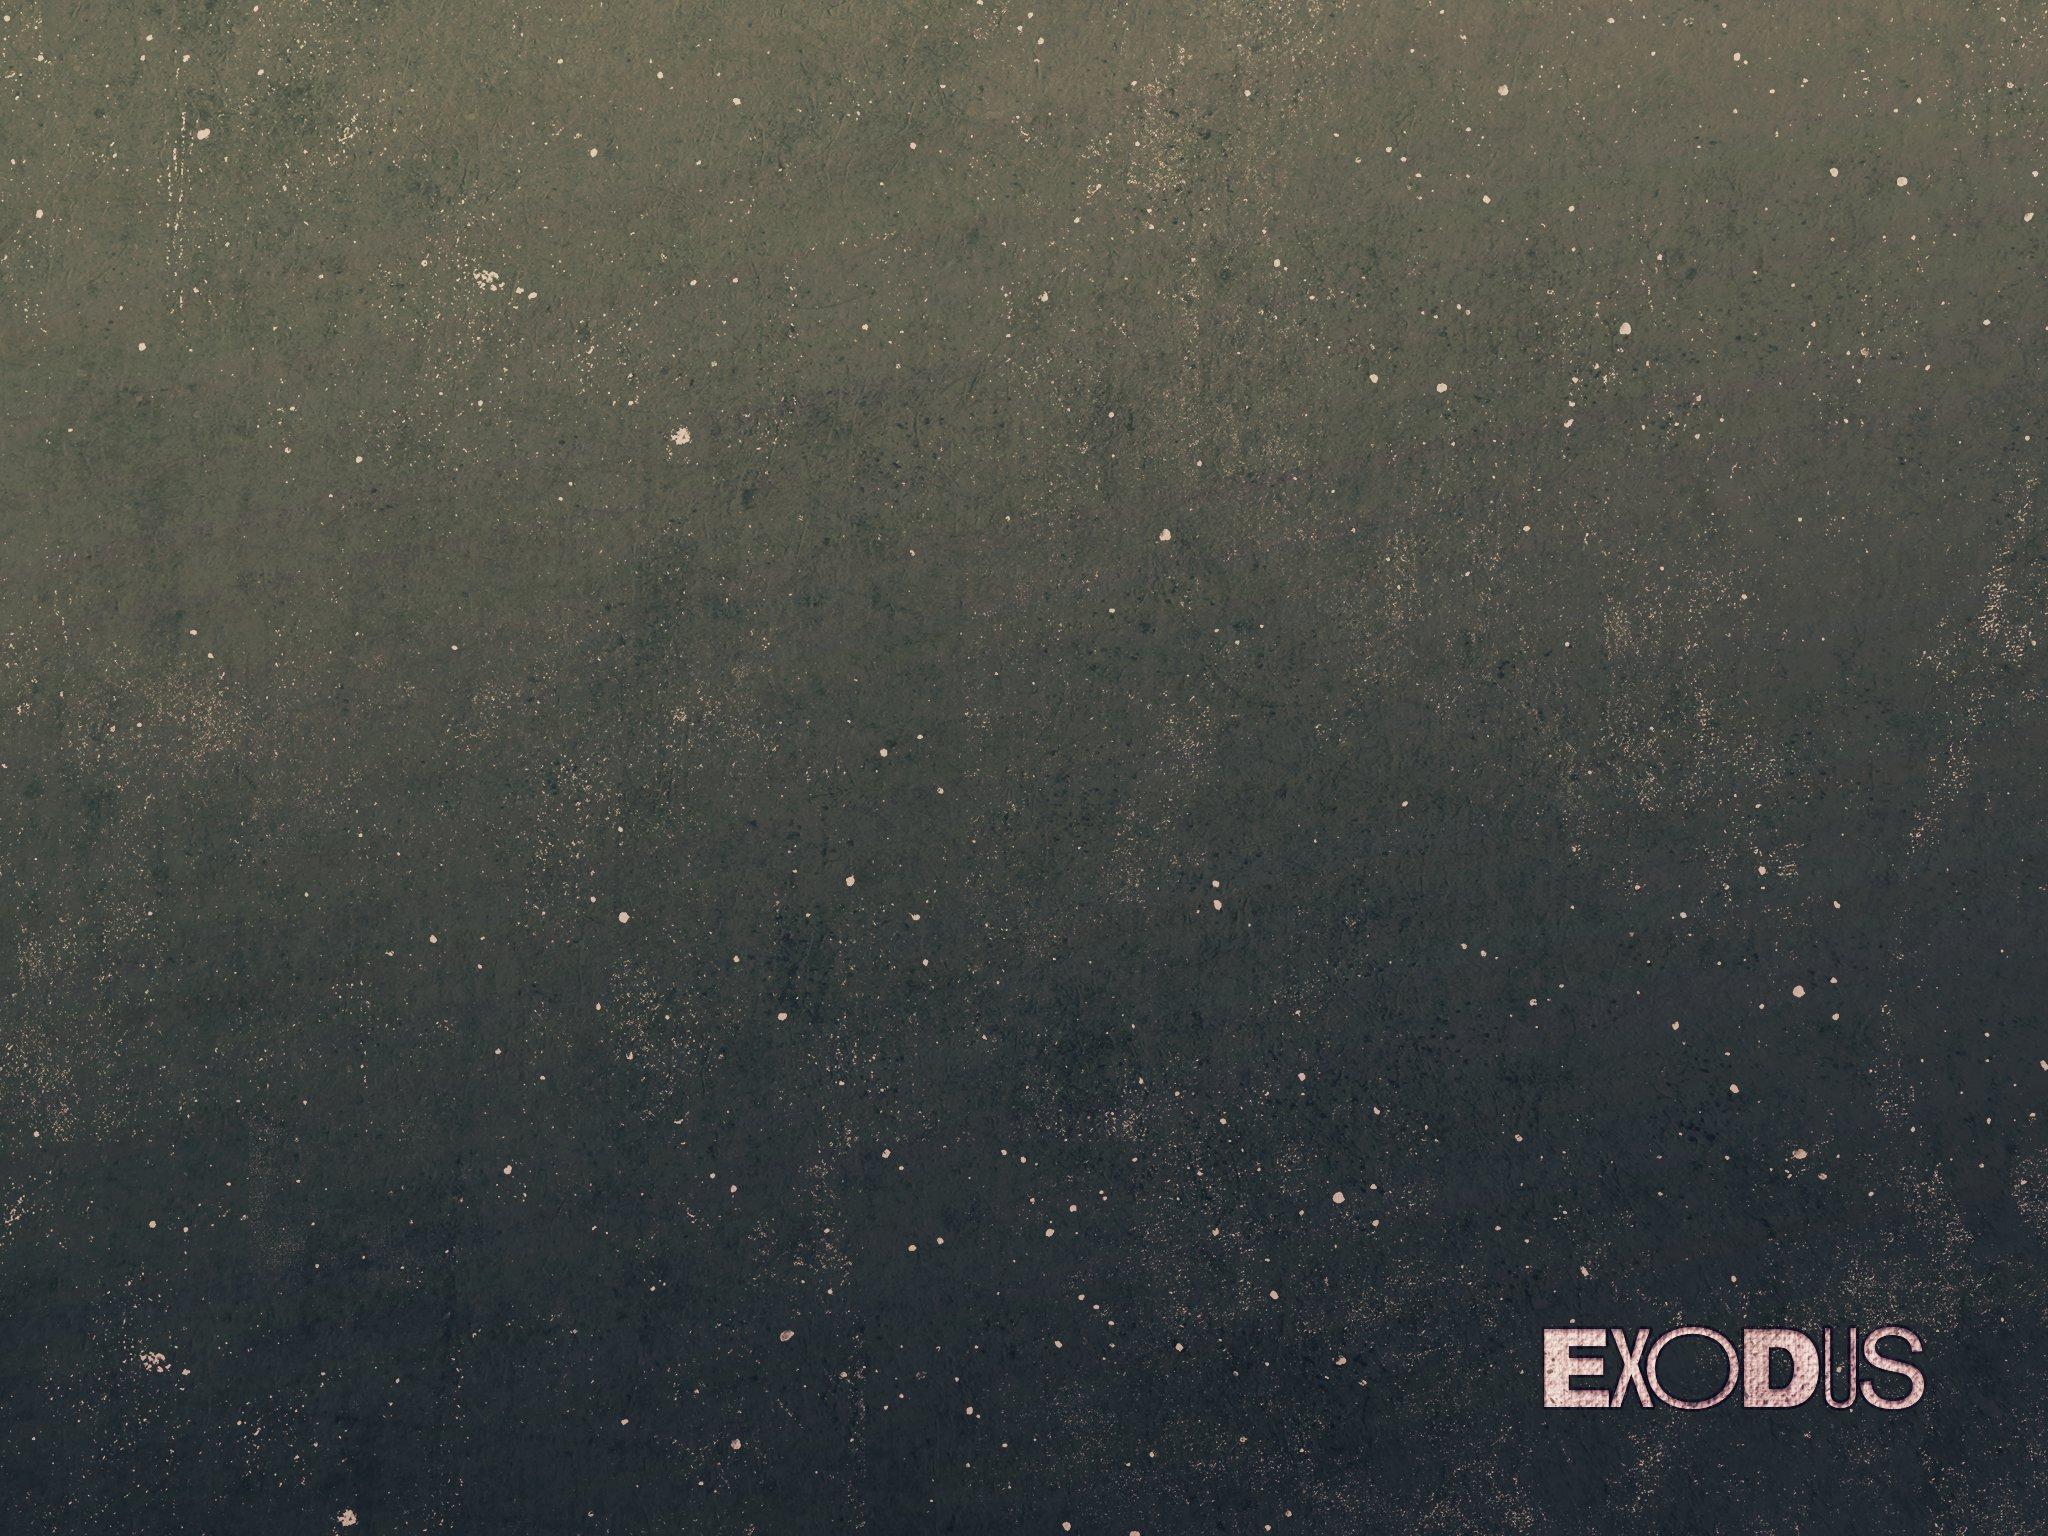 02-Exodus_Secondary_4x3-fullscreen.jpg